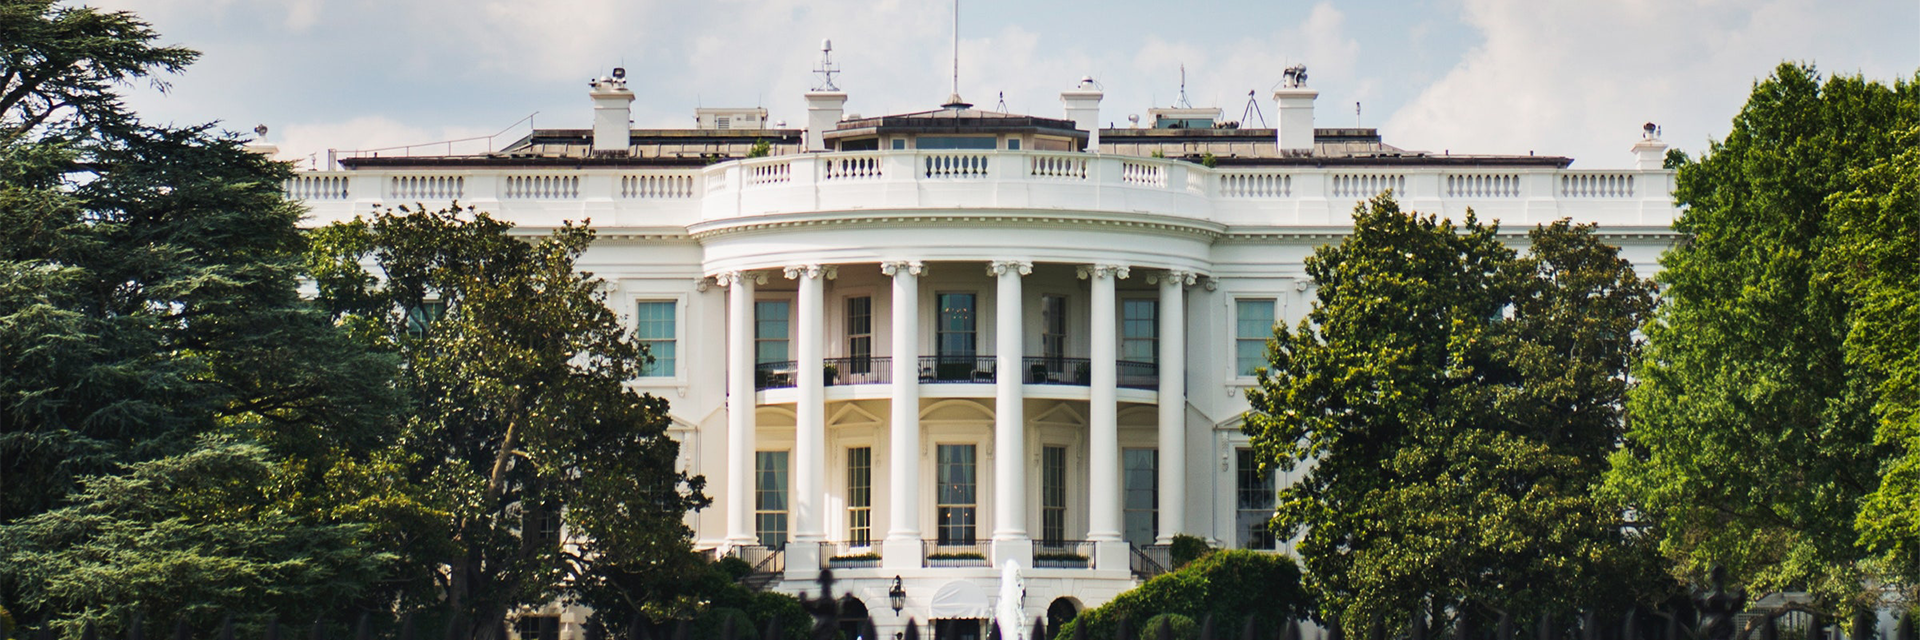 Exterior of White House